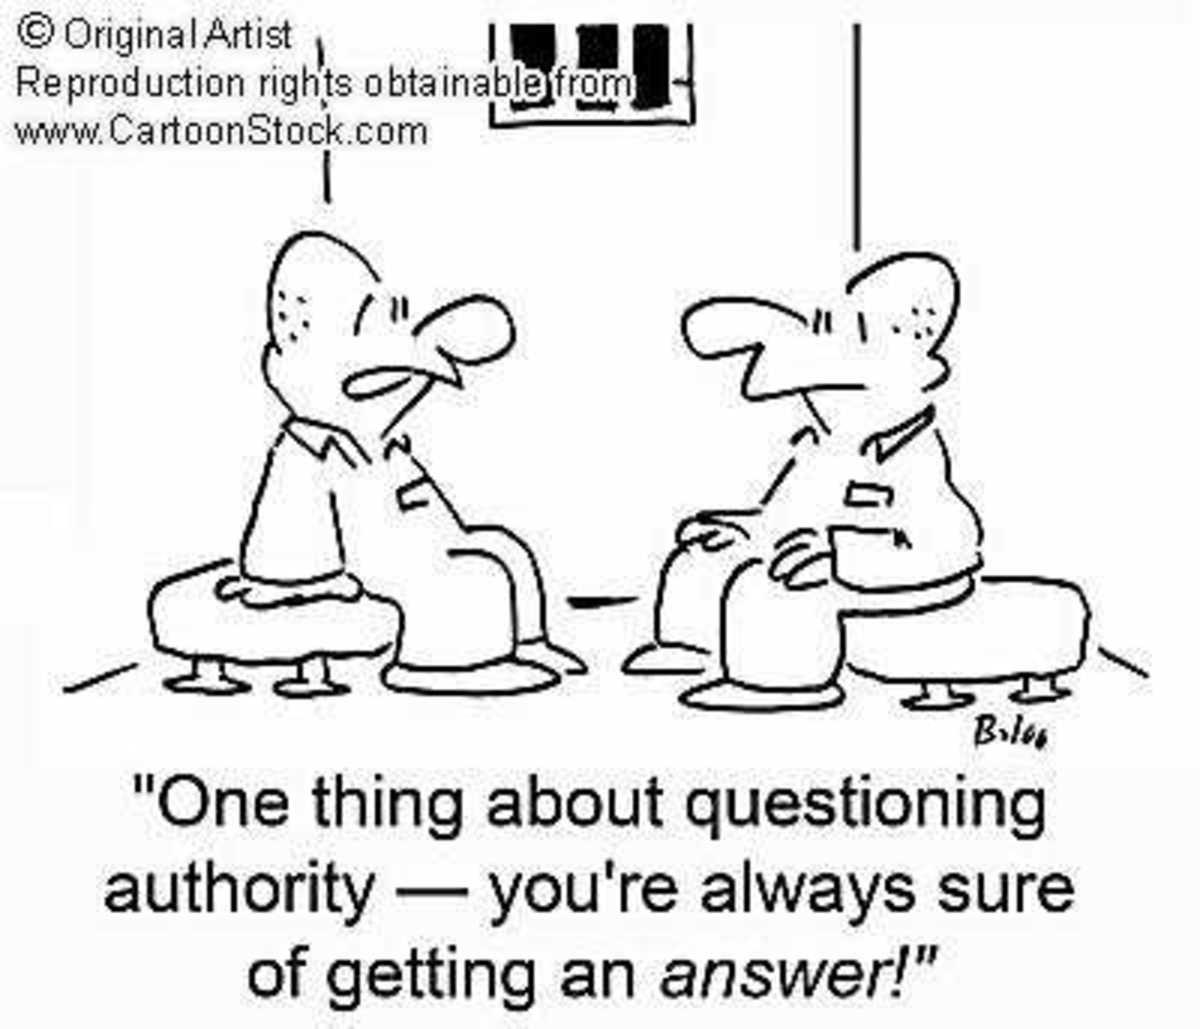 Credit: www.CartoonStock.com